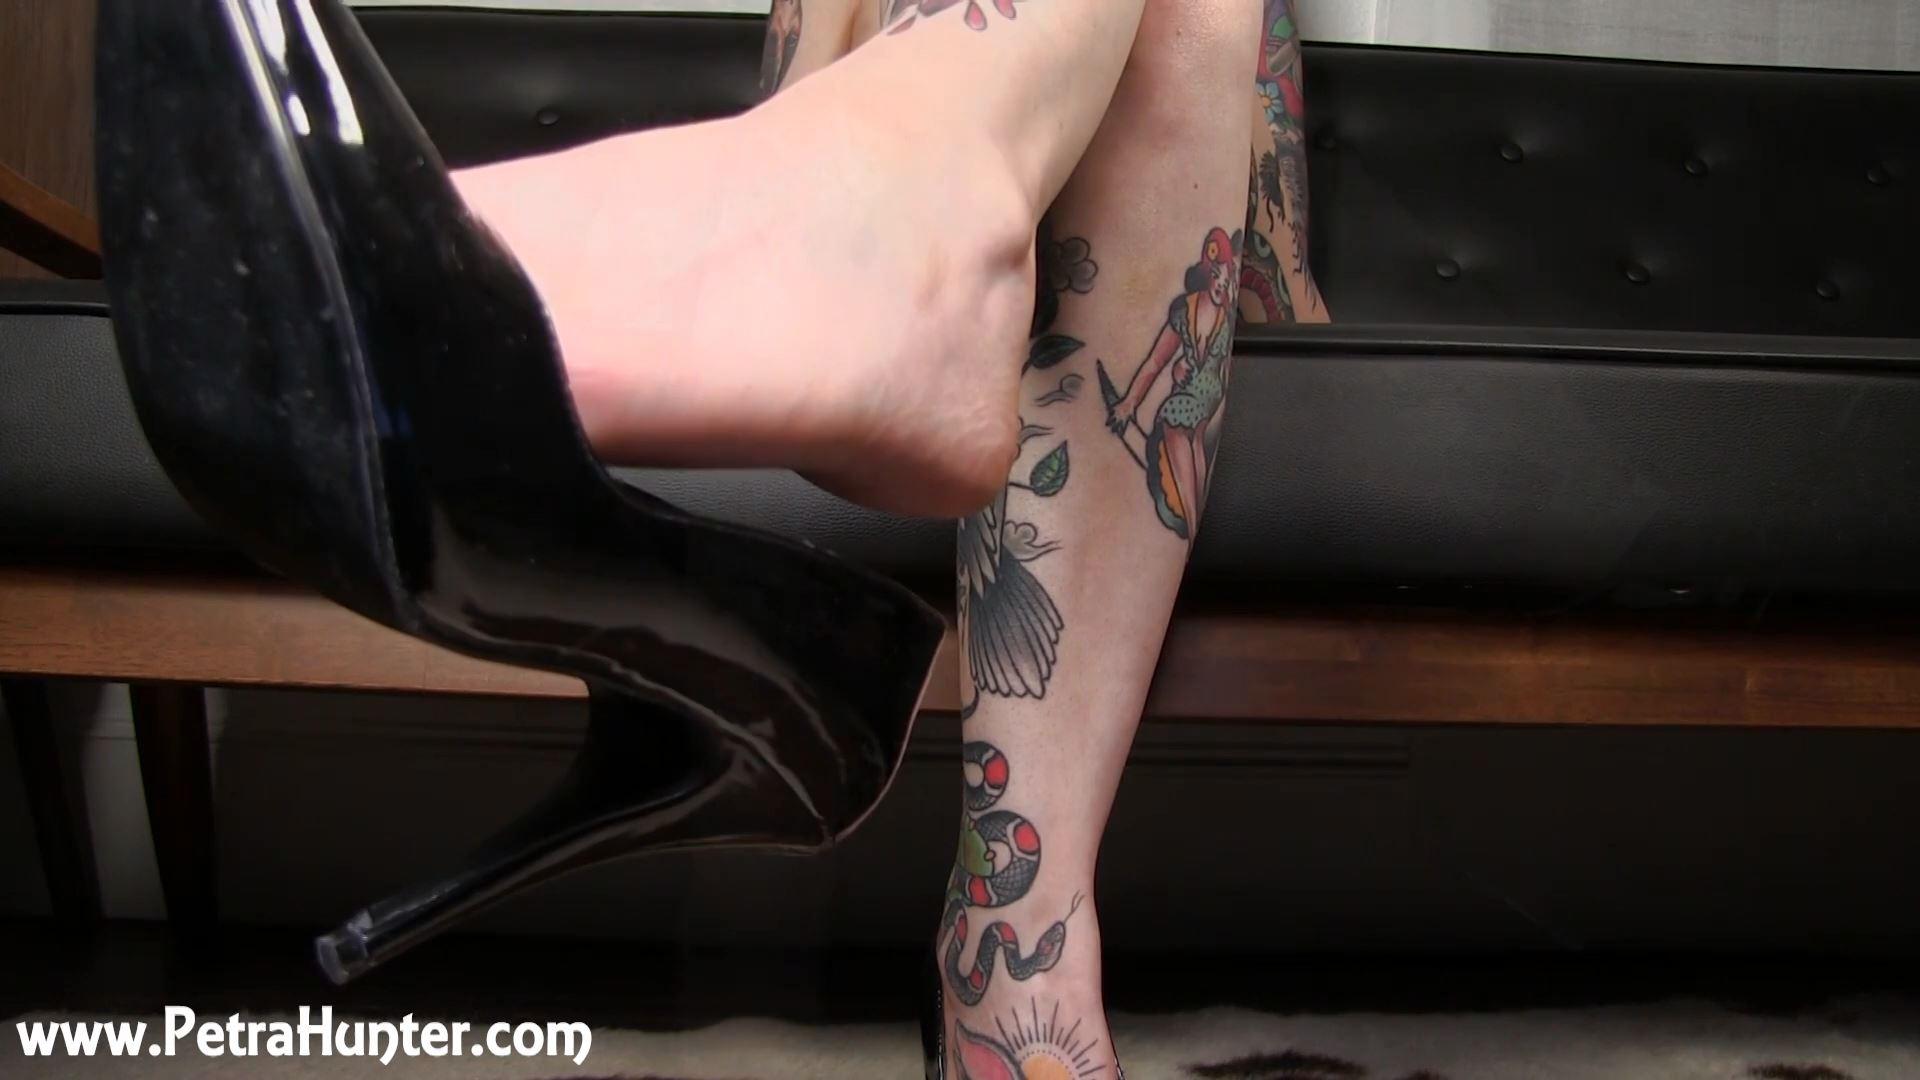 Mistress Petra Hunter In Scene: Dangling My Shiny Heels - STREAMPETRA - FULL HD/1080p/MP4